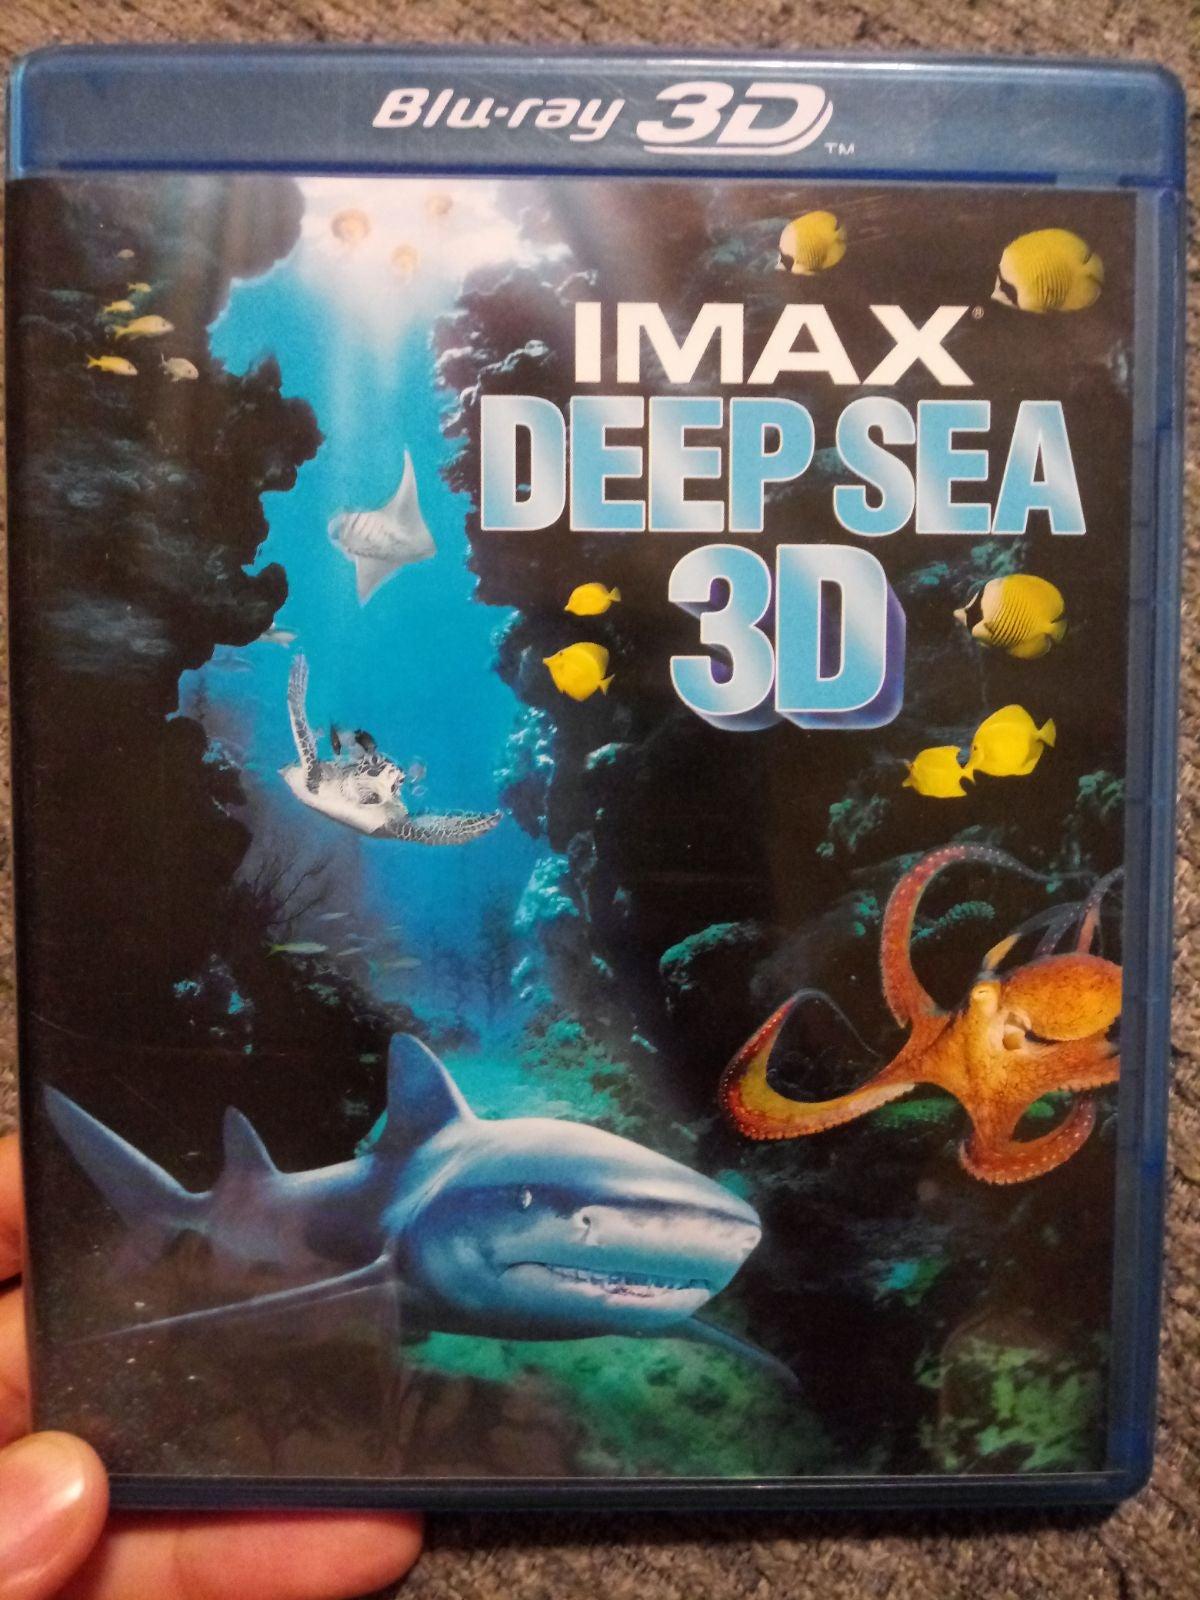 IMAX DEEP SEA 3D BLU-RAY!